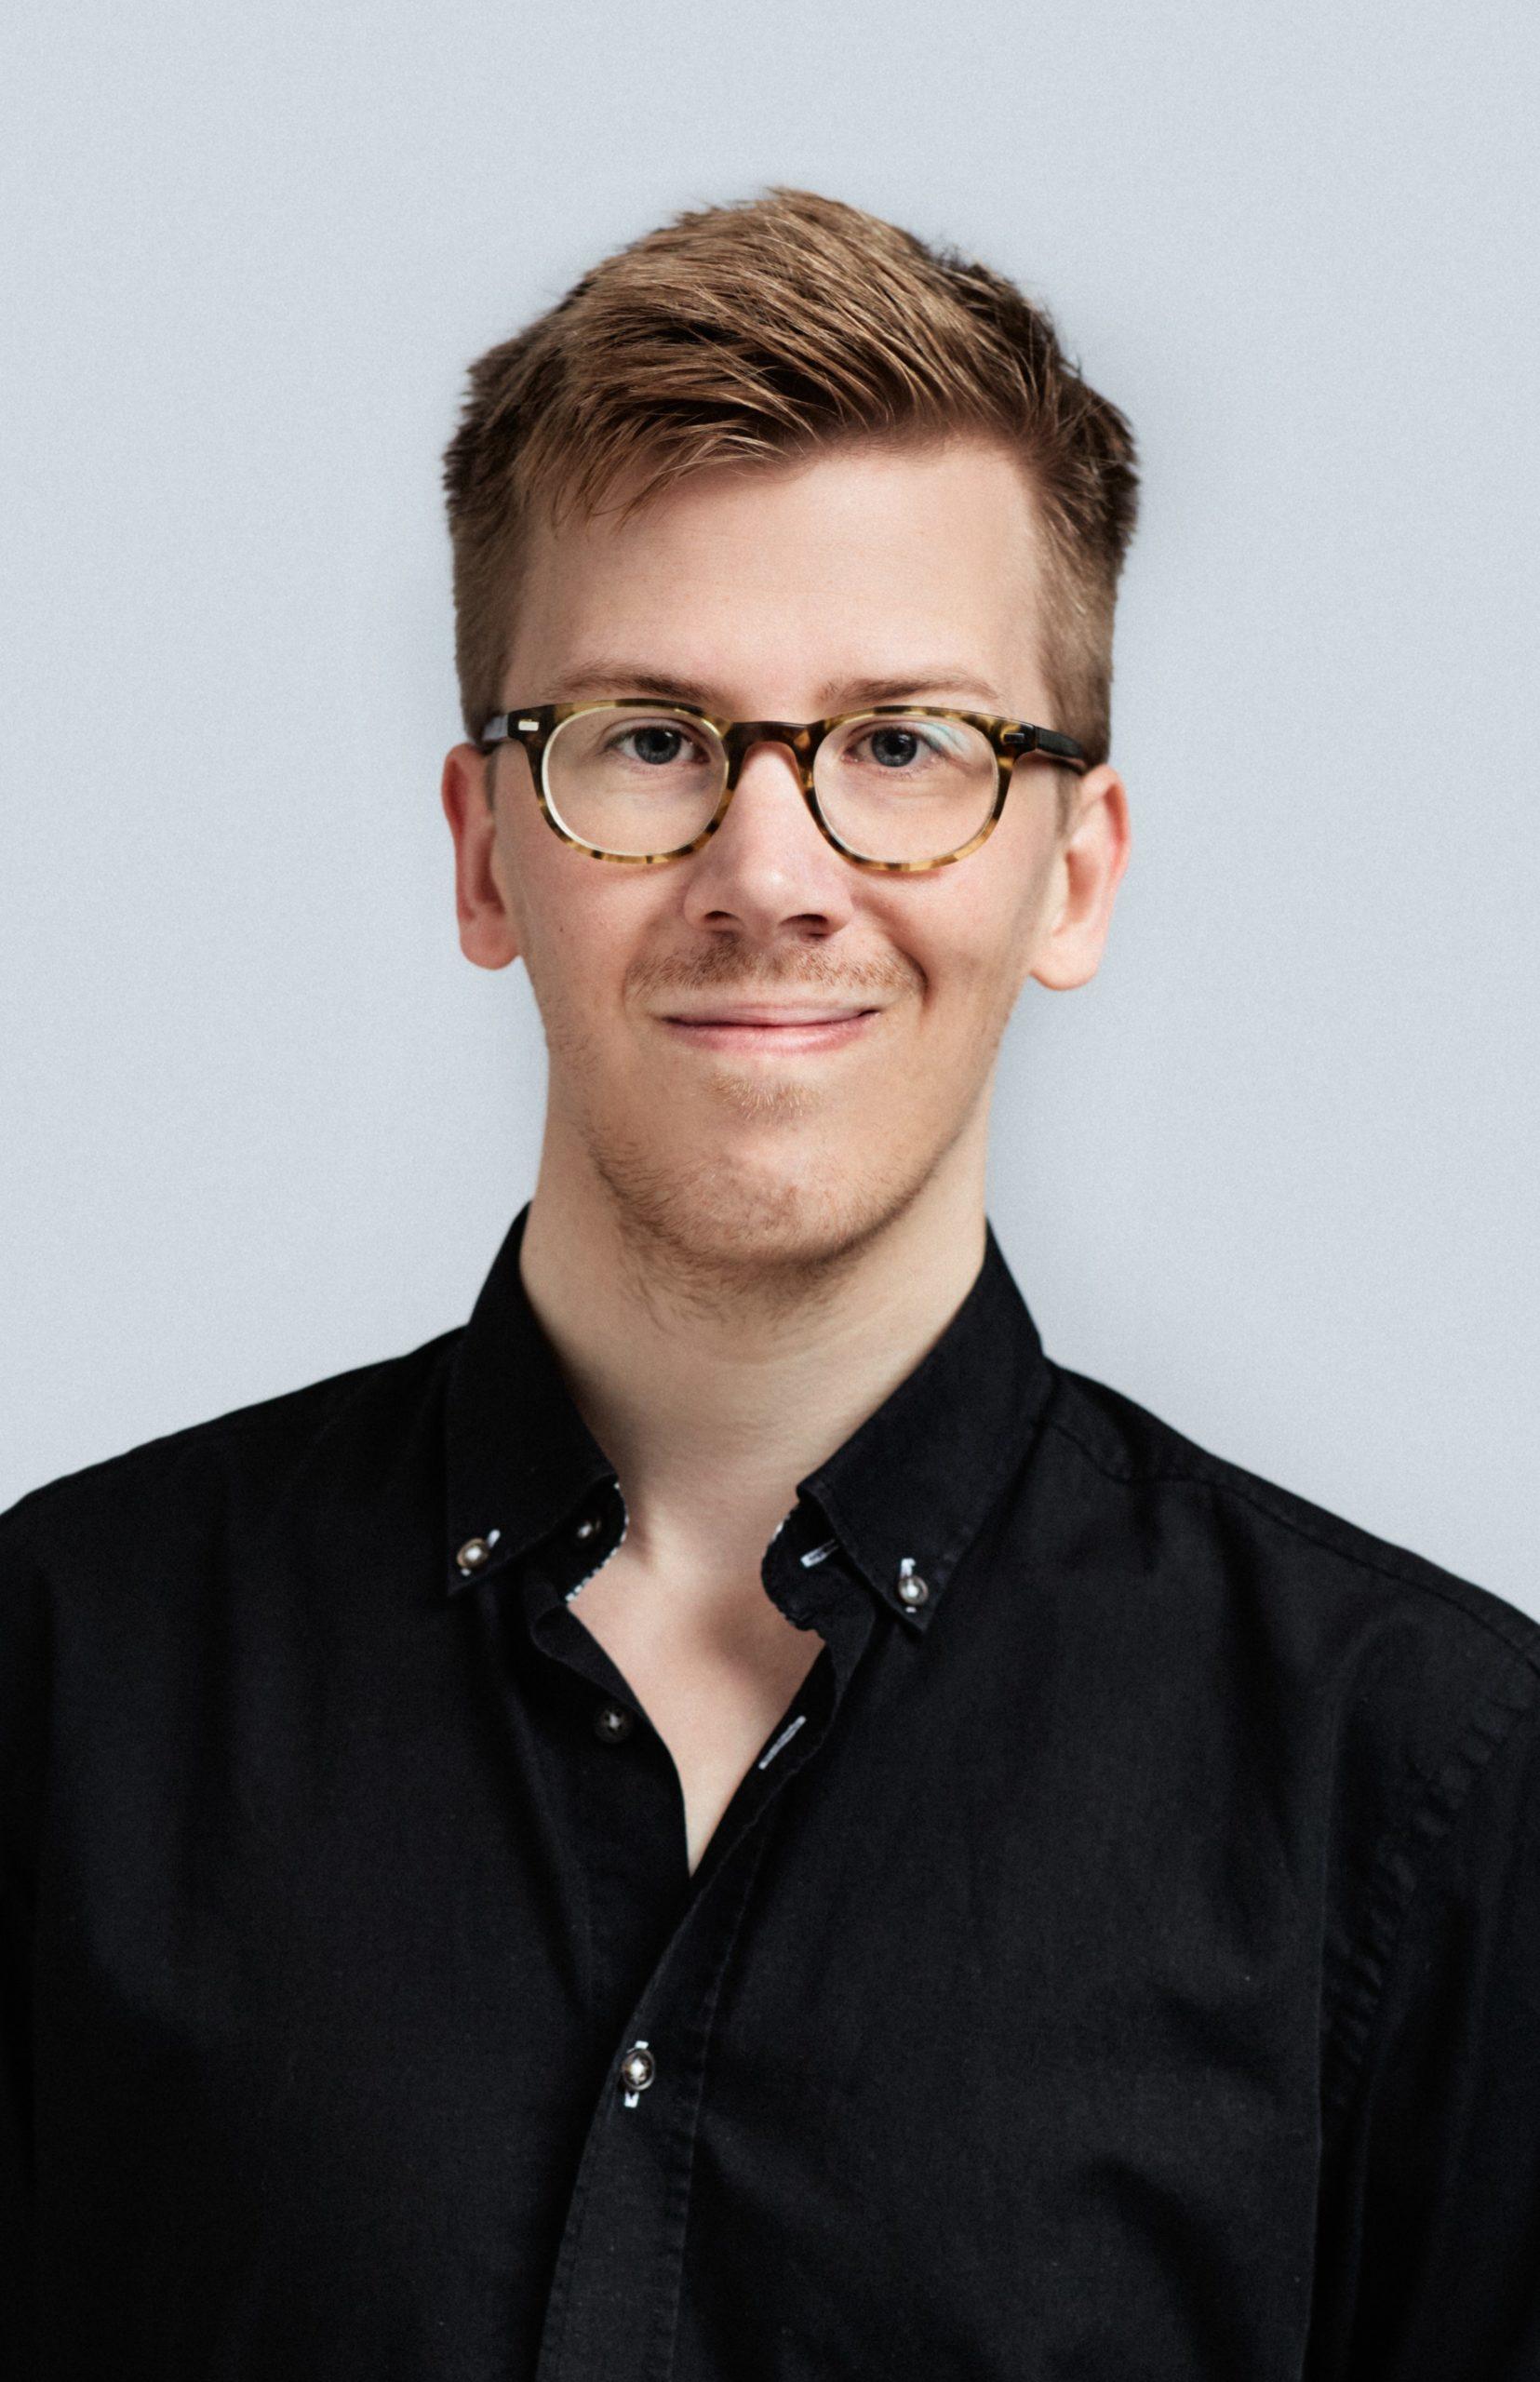 https://usercontent.one/wp/glostrupradikale.dk/wp-content/uploads/2021/01/Mikkel-4-scaled.jpg